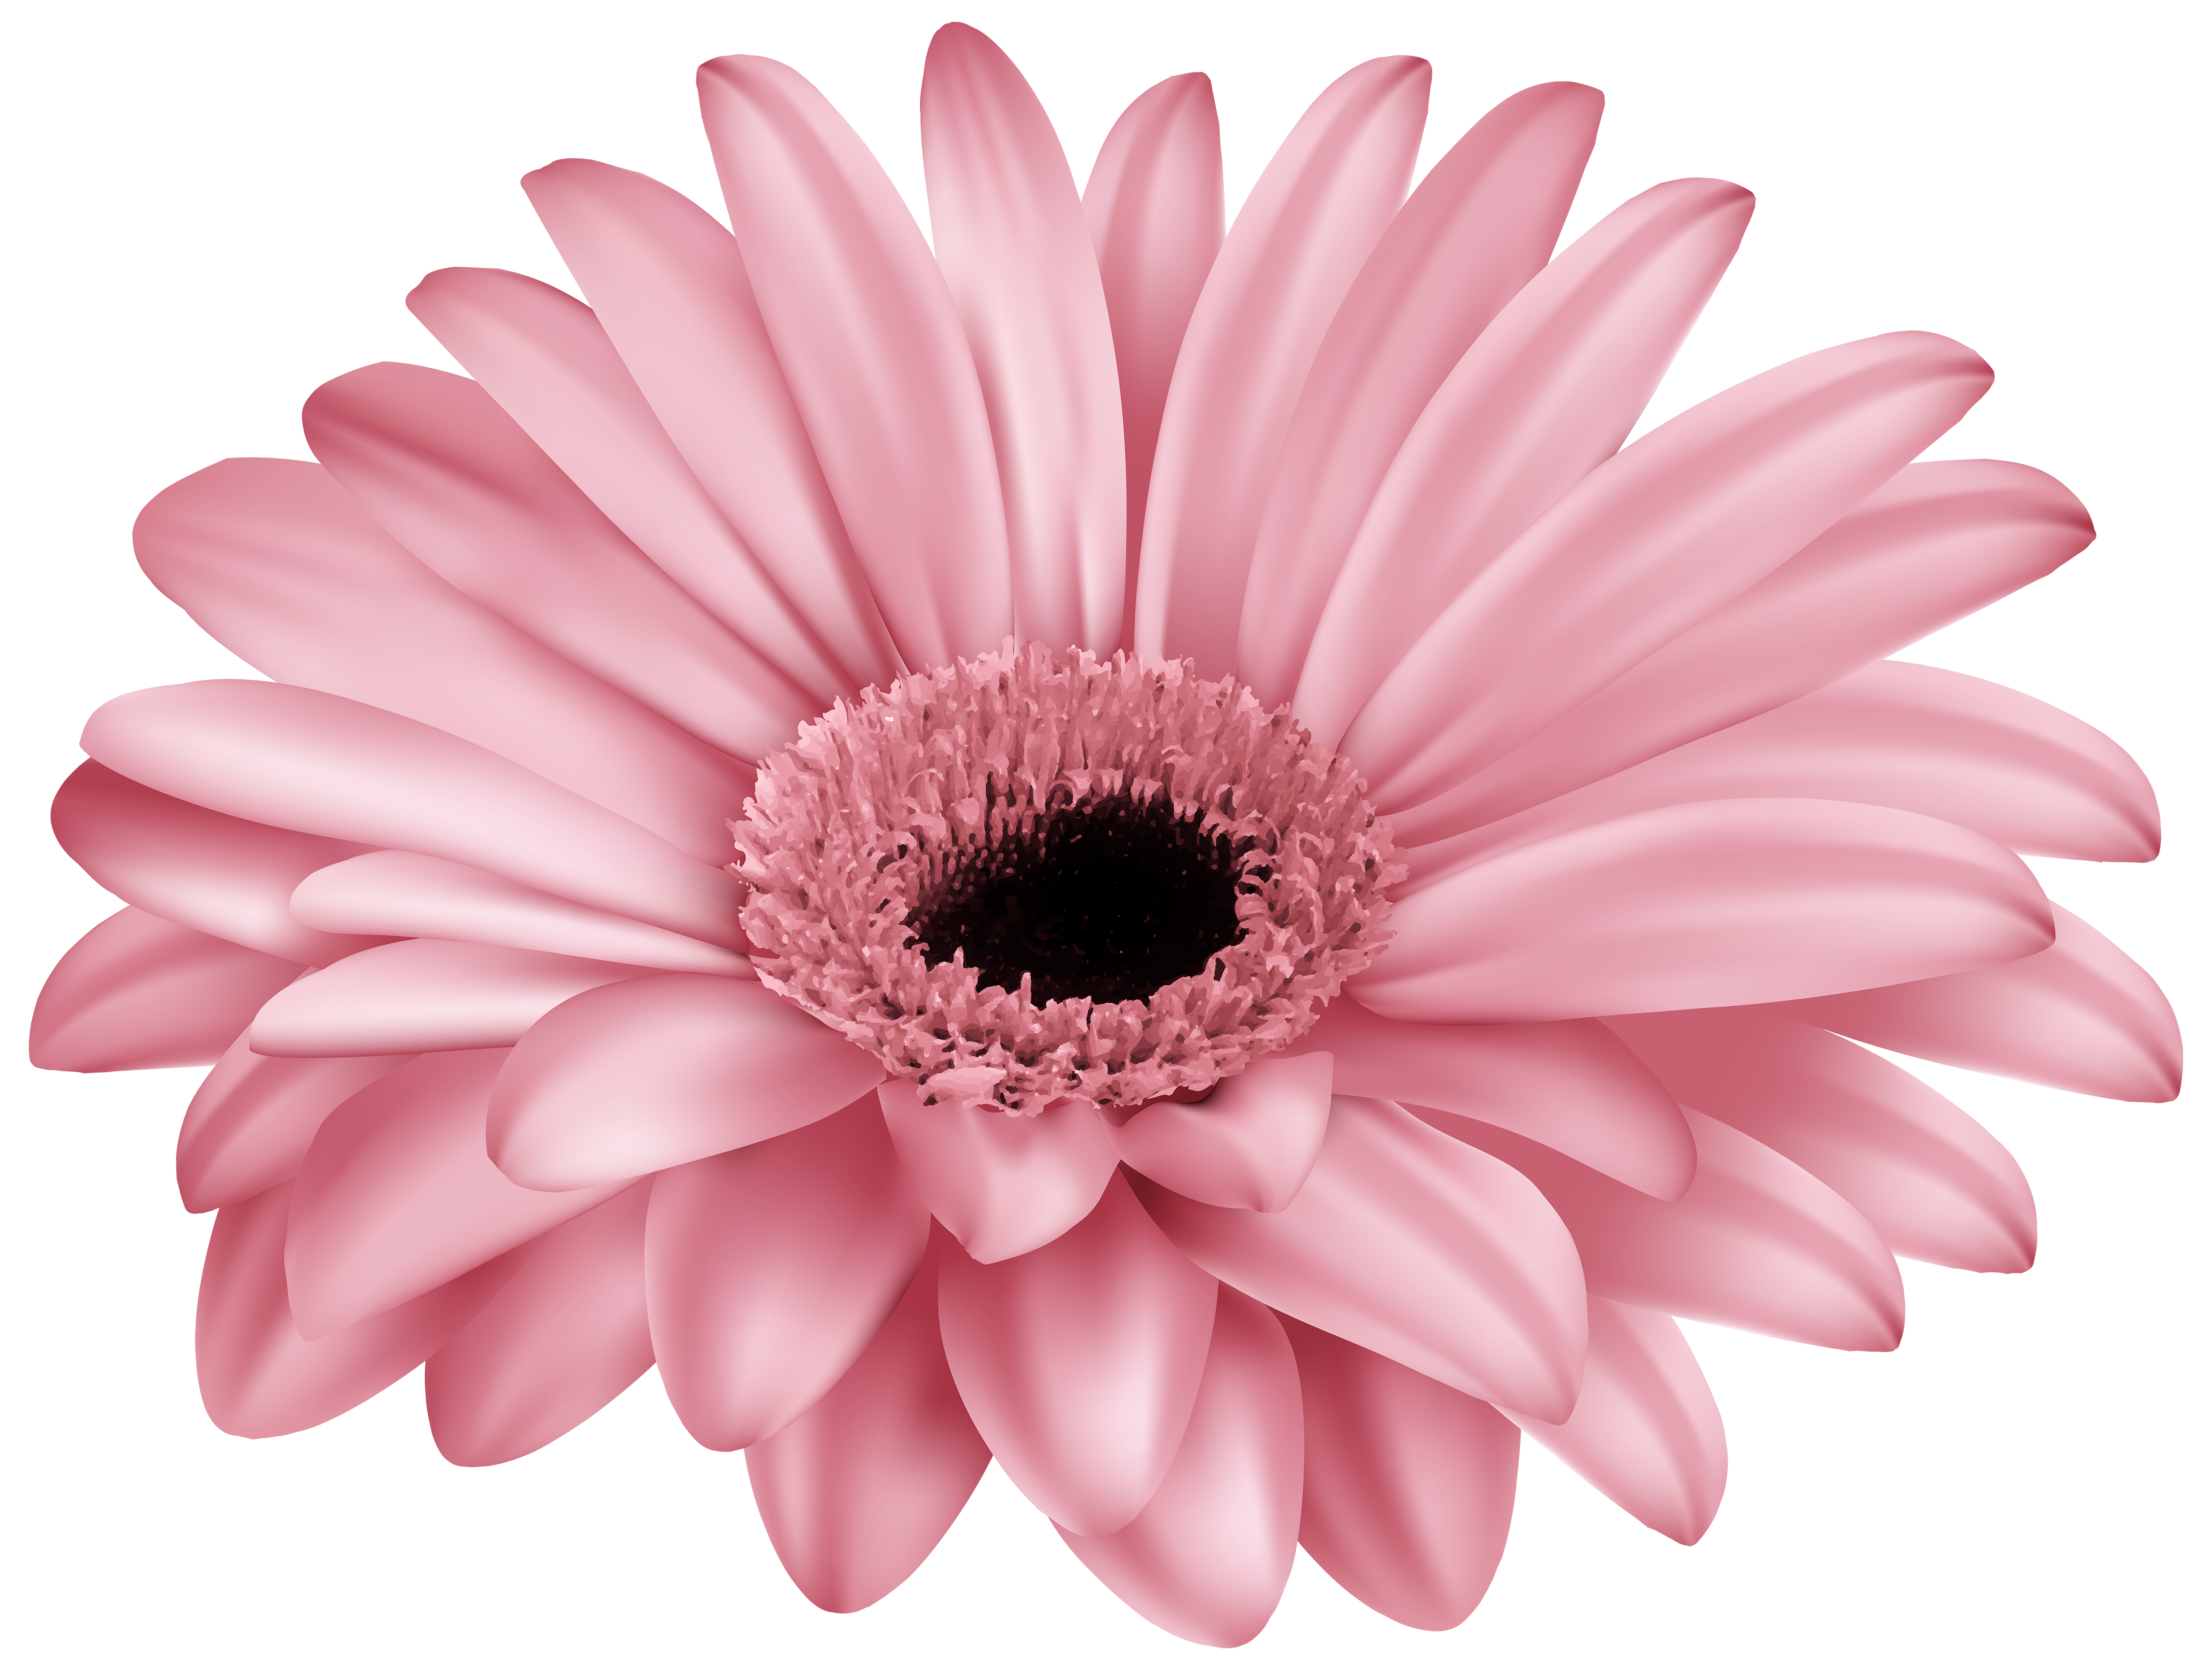 Gerber logo clipart vector freeuse download Pink Gerber PNG Clip Art Image | Gallery Yopriceville - High ... vector freeuse download